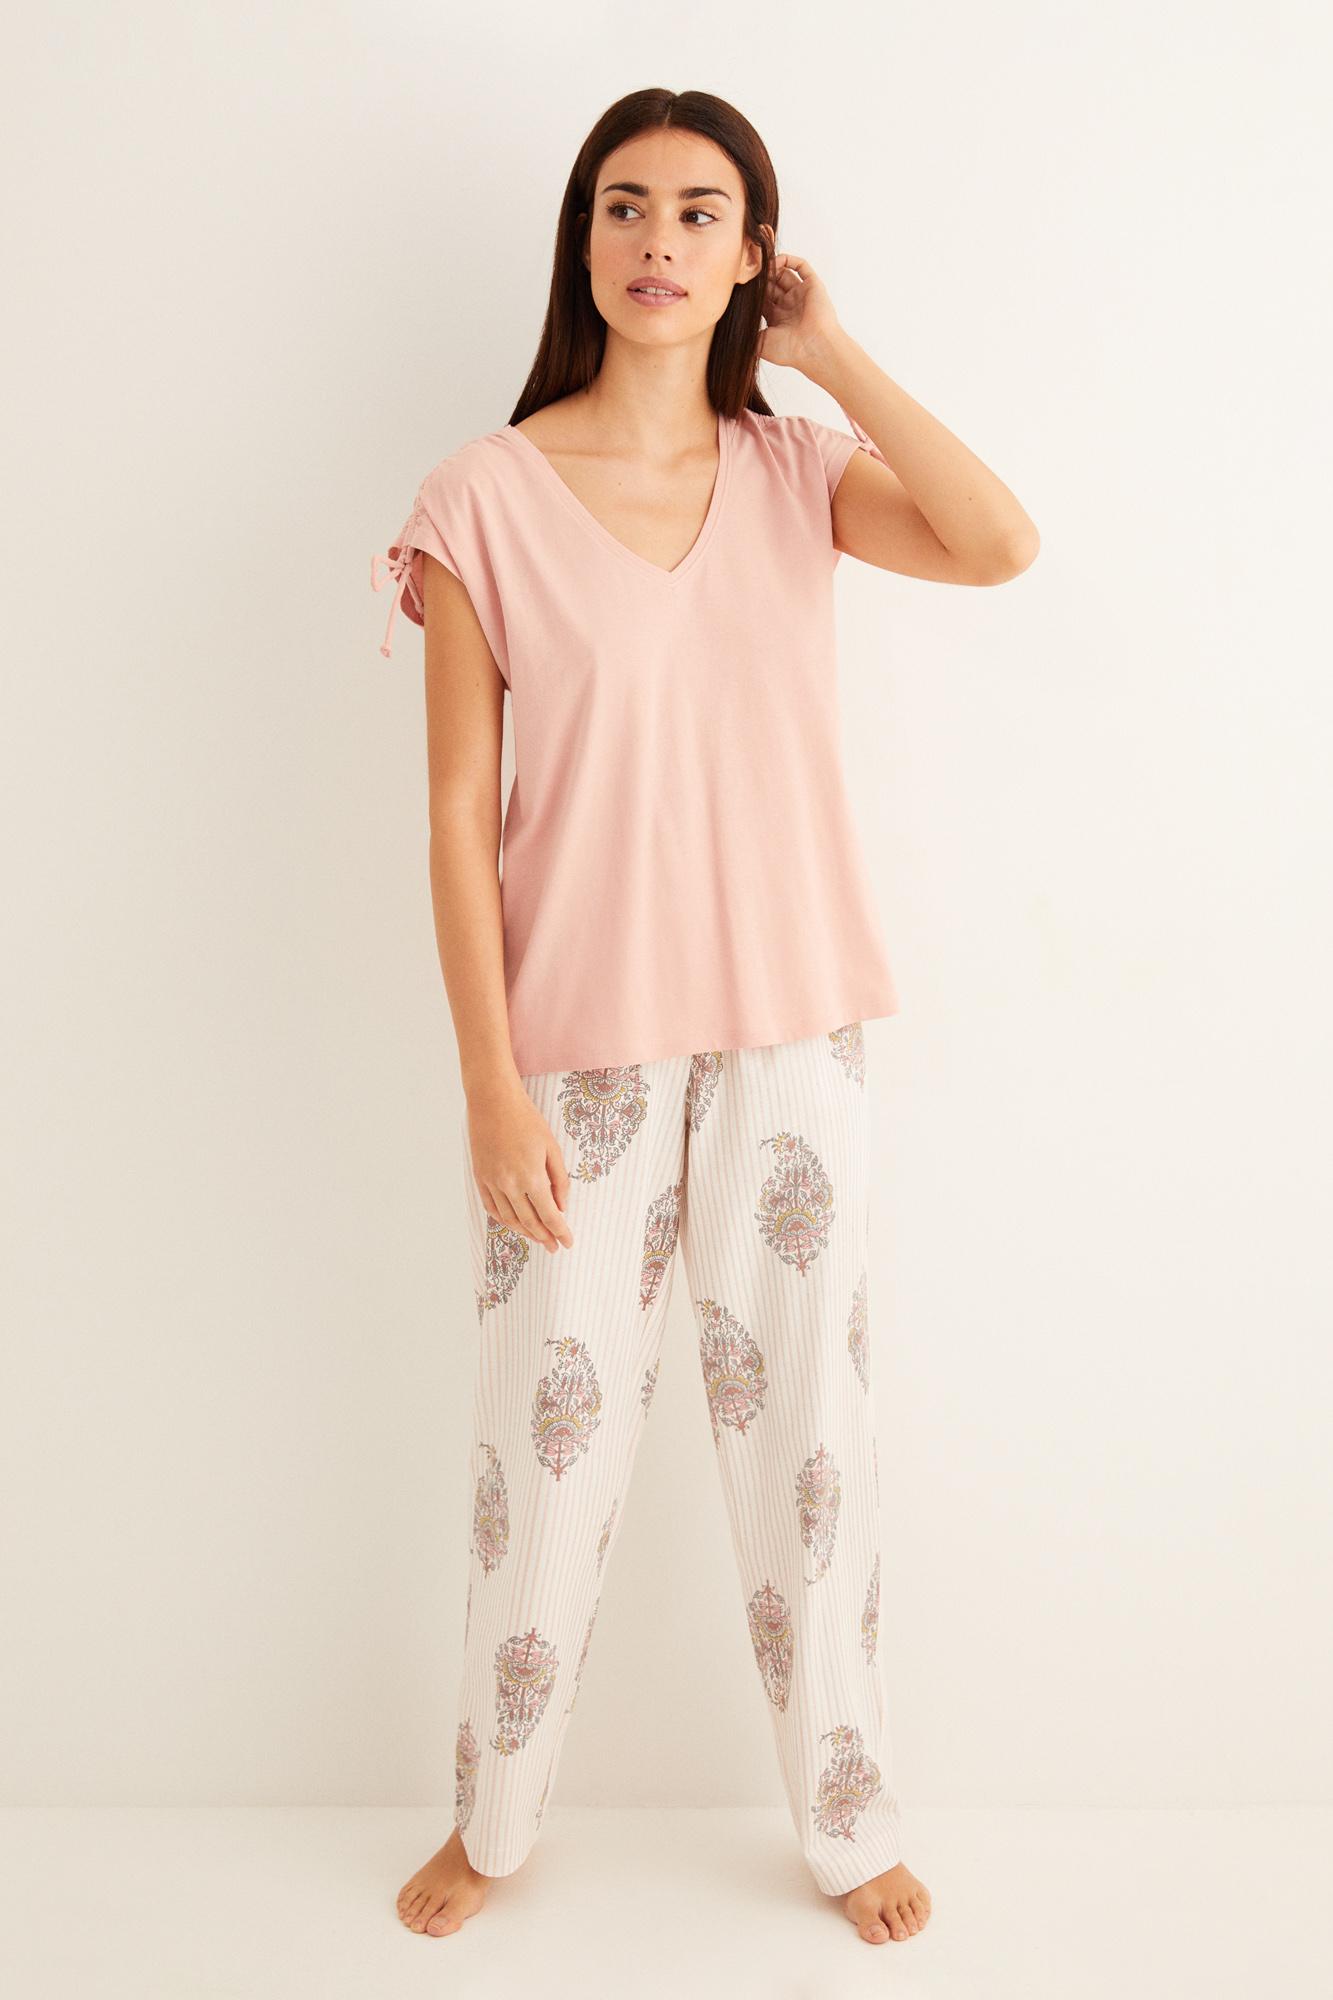 Pijama largo estampado | Pijamas largos | Women'secret